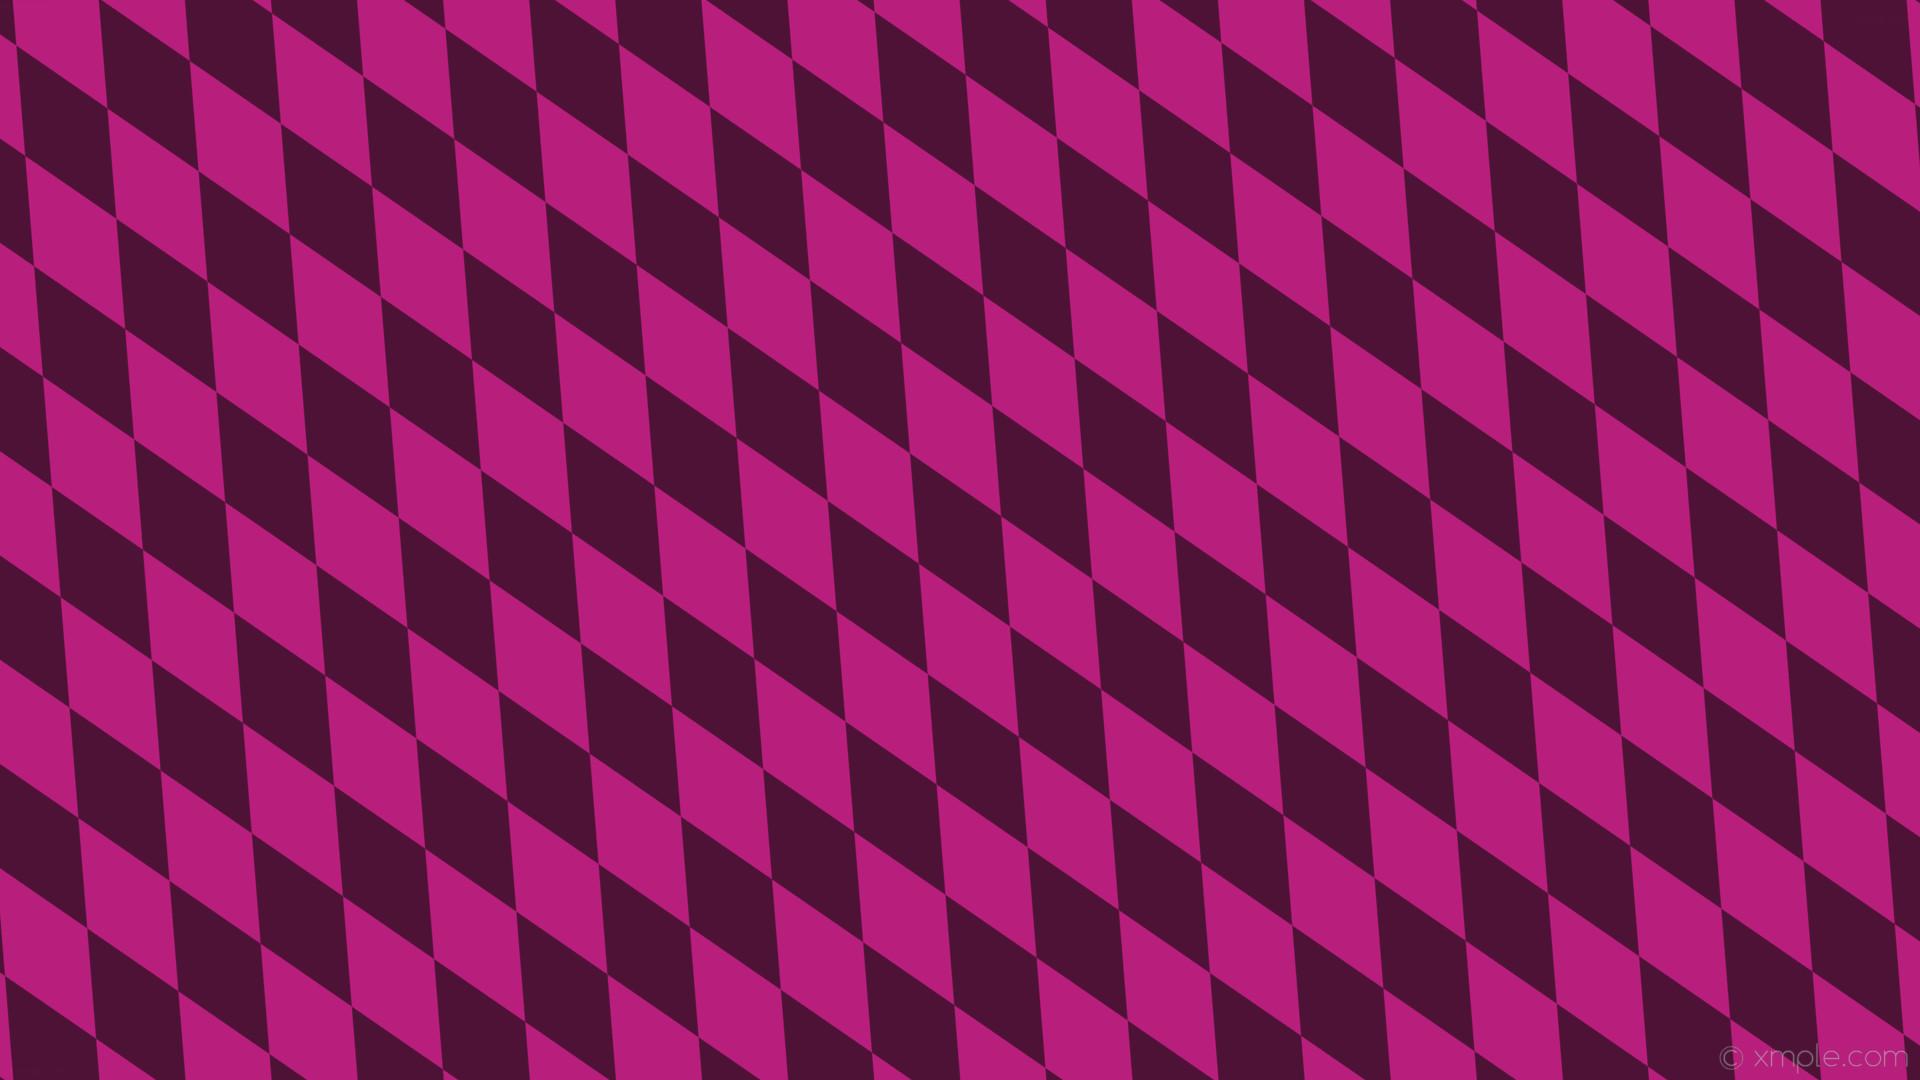 wallpaper pink diamond lozenge rhombus dark pink #4e1237 #b81e7c 120° 200px  95px